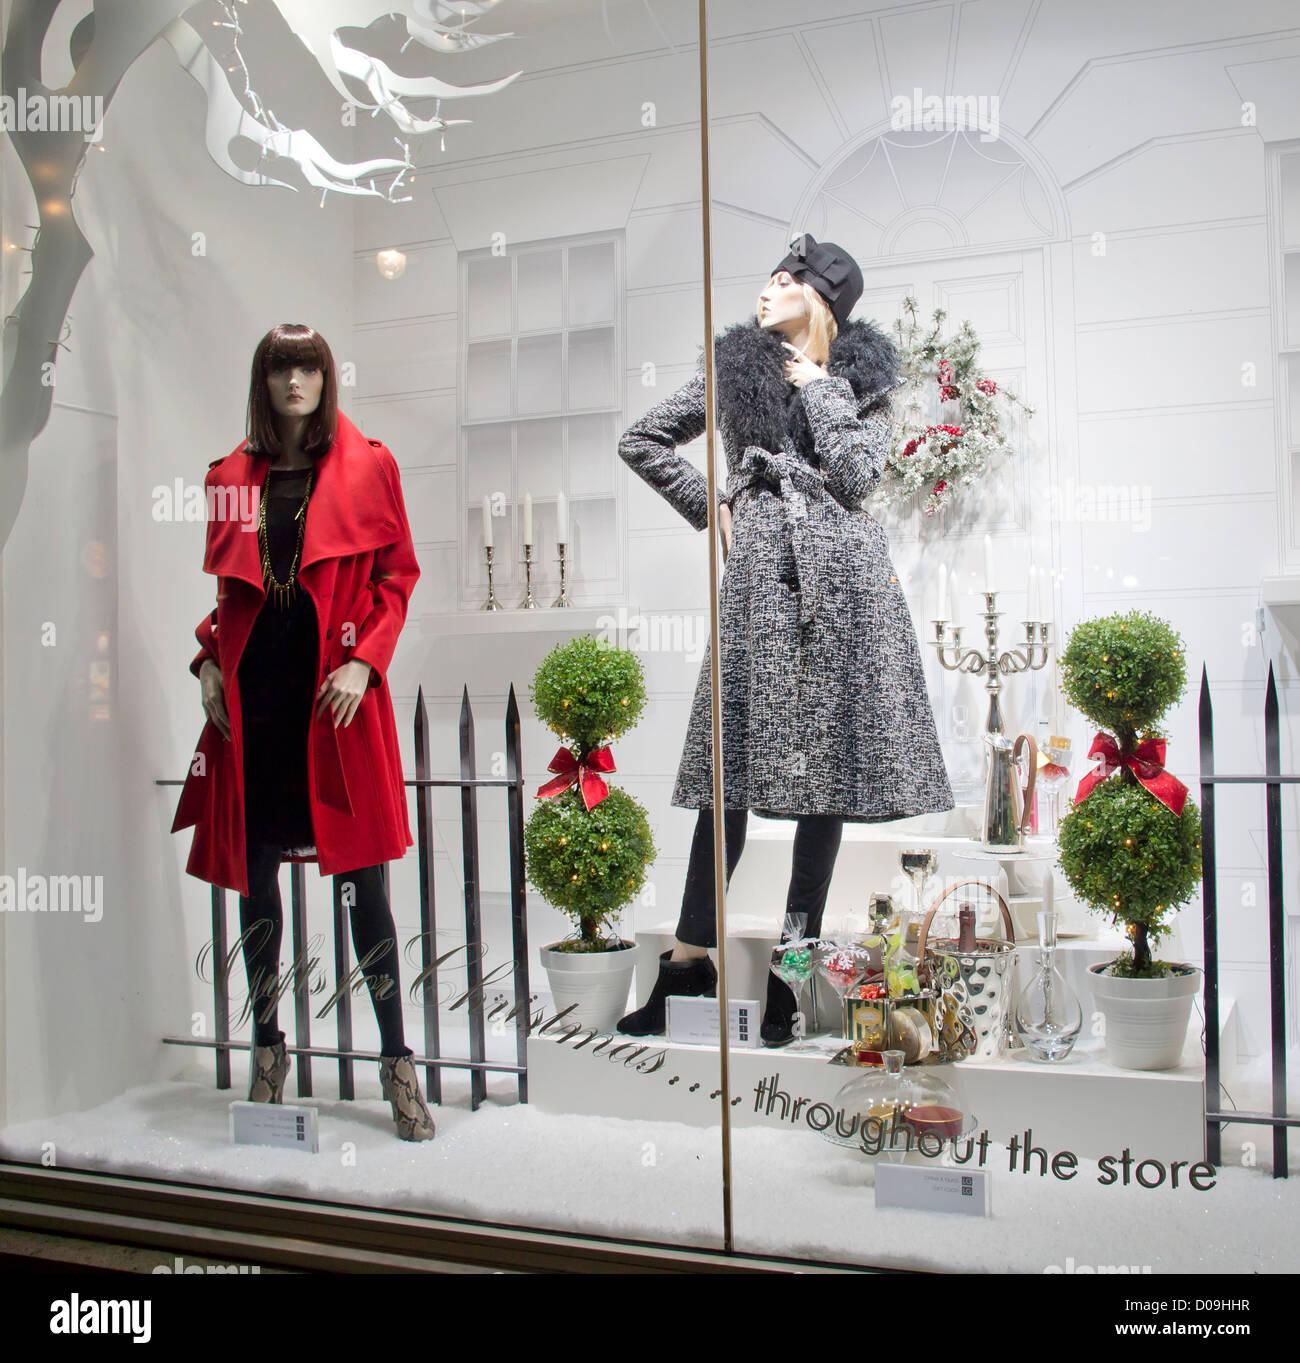 Window Displays Of Womens Clothing